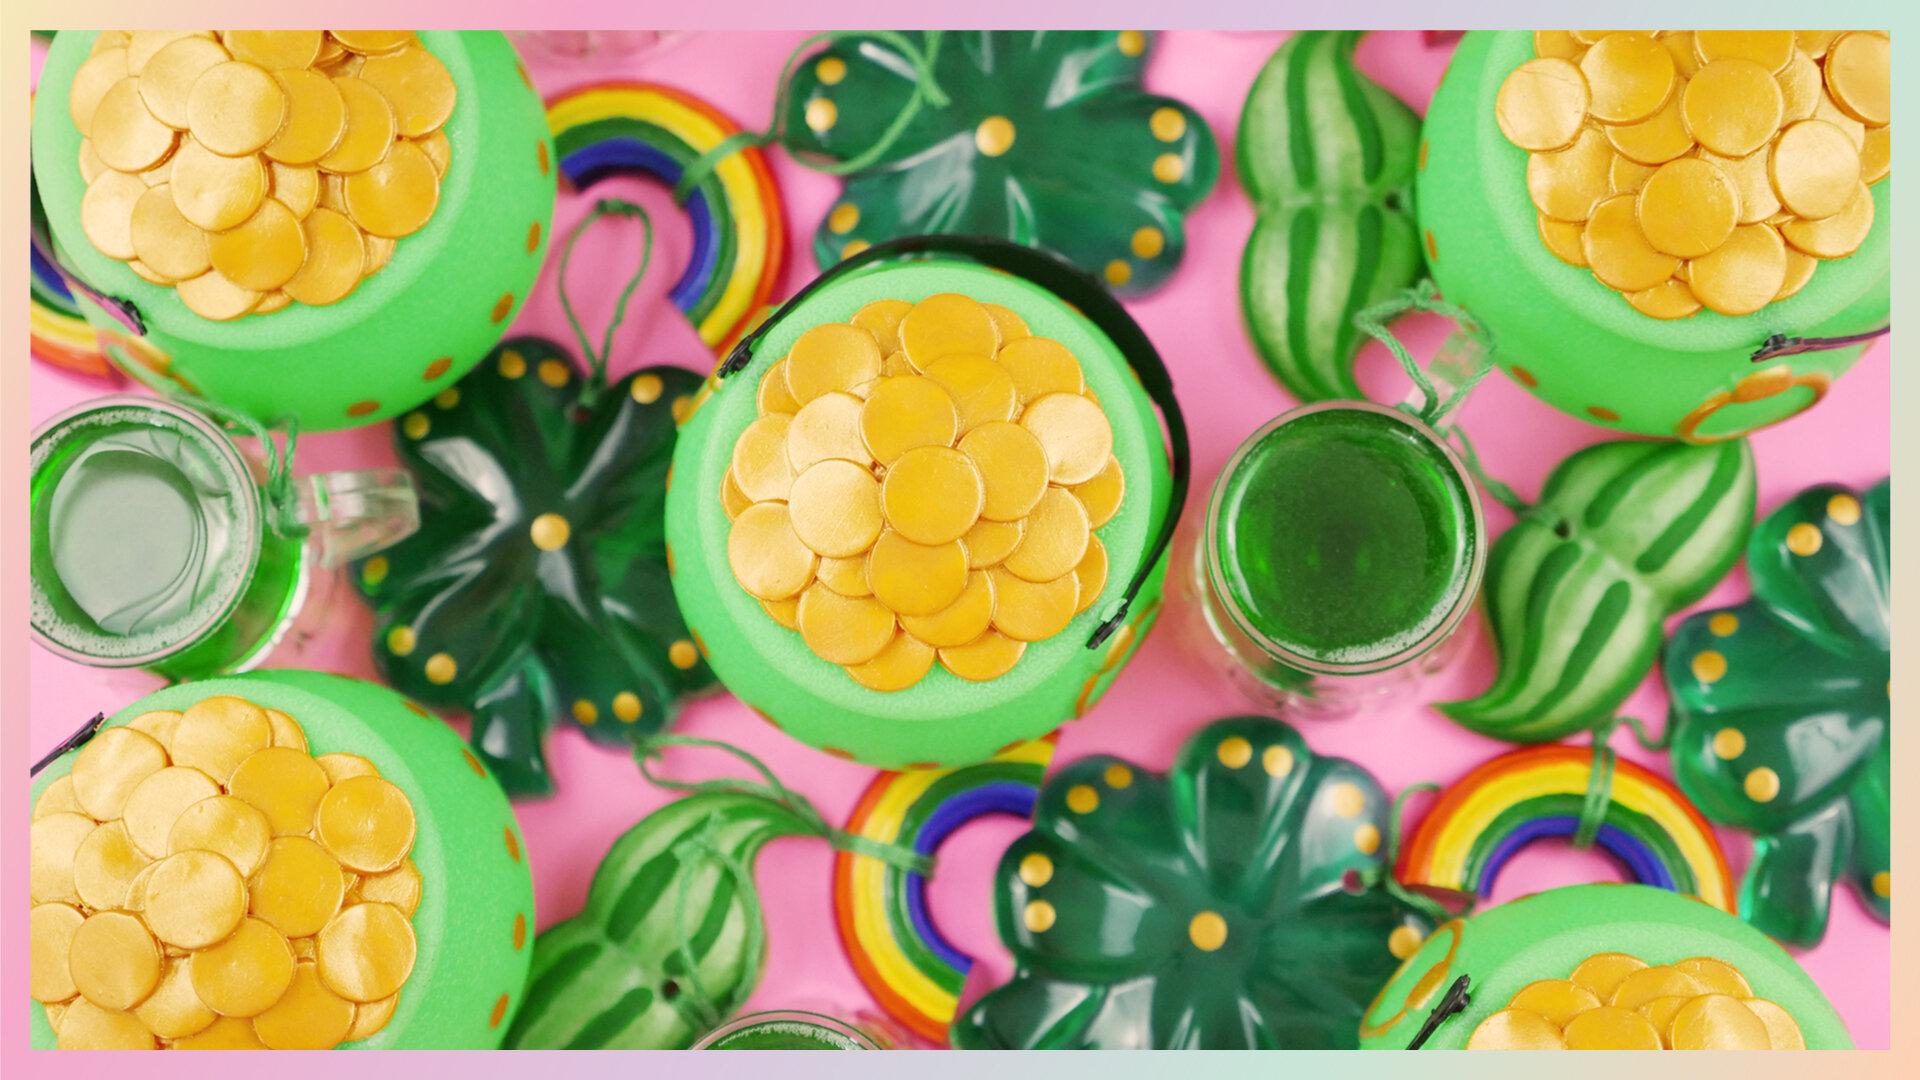 Amosfun holz vierbl/ättriges kleeblatt ornamente st patricks day diy holz kunsthandwerk kleeblatt holz h/ängende verzierungen gastgeschenke dekorationen 20 st/ück